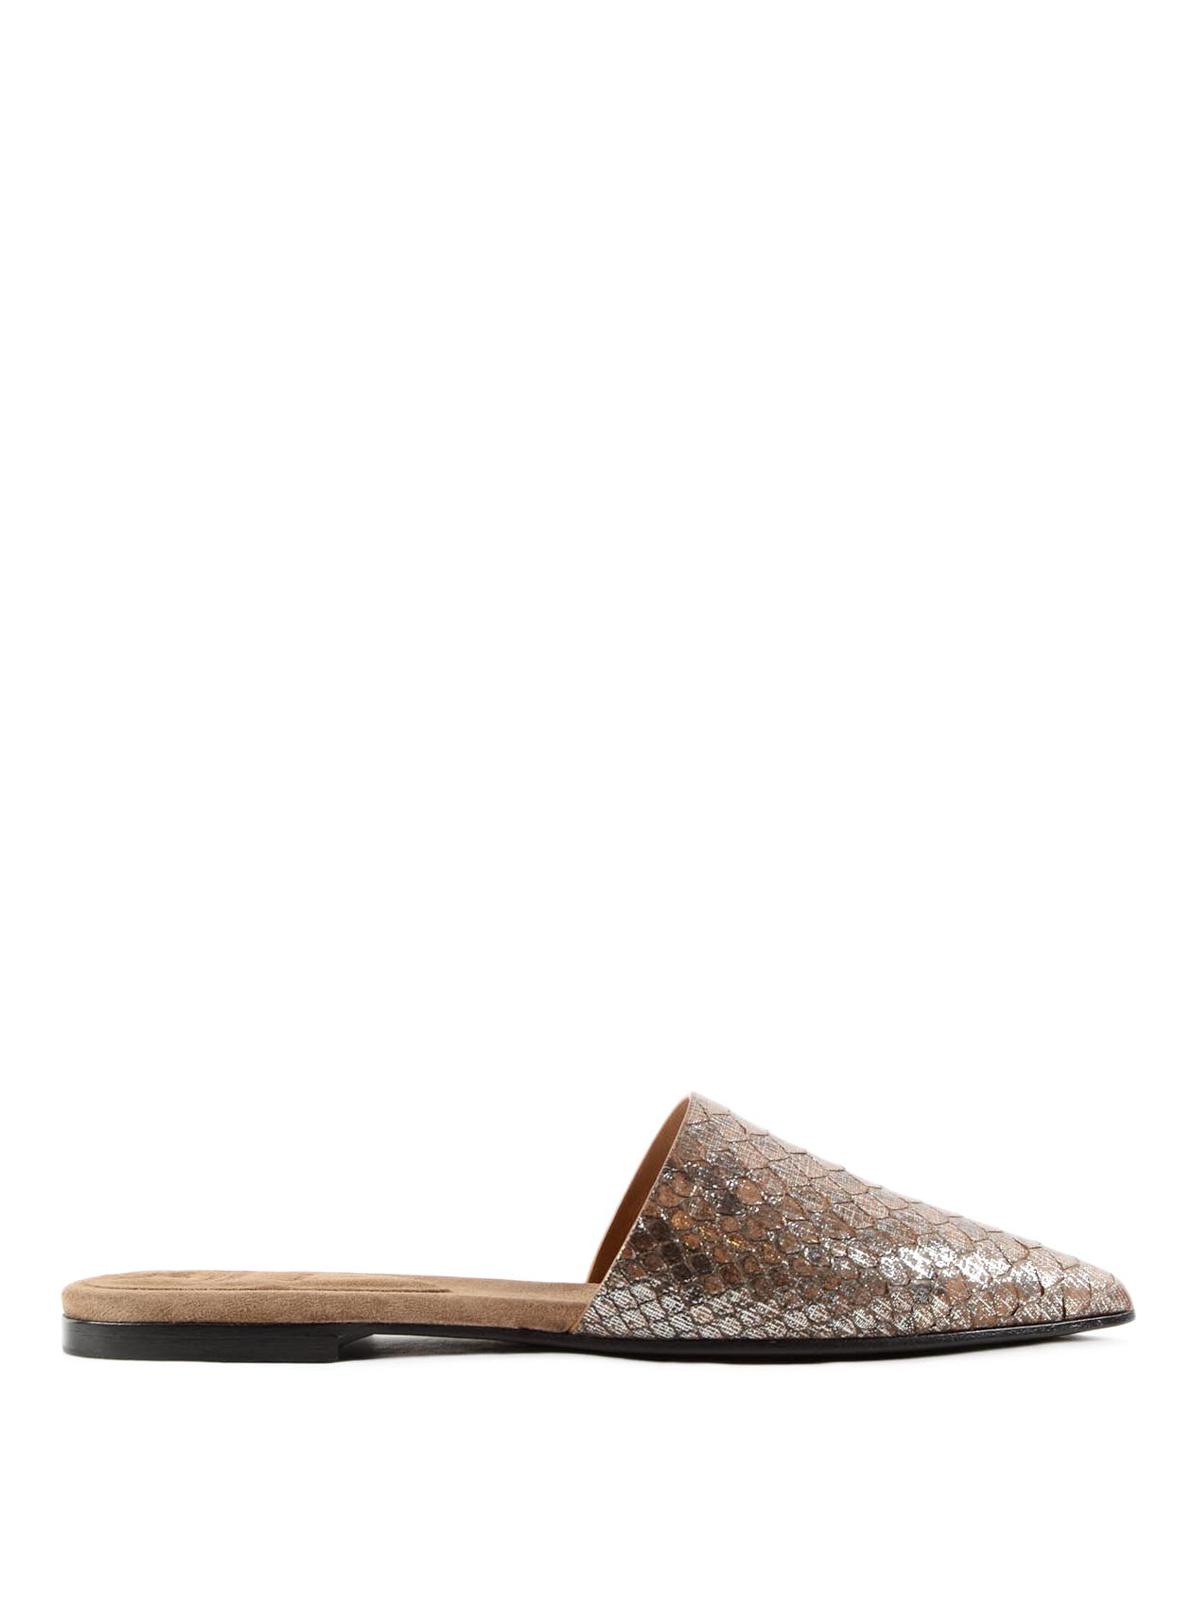 3bcbb6160fc10 Brunello Cucinelli - Laminated python mules - mules shoes ...